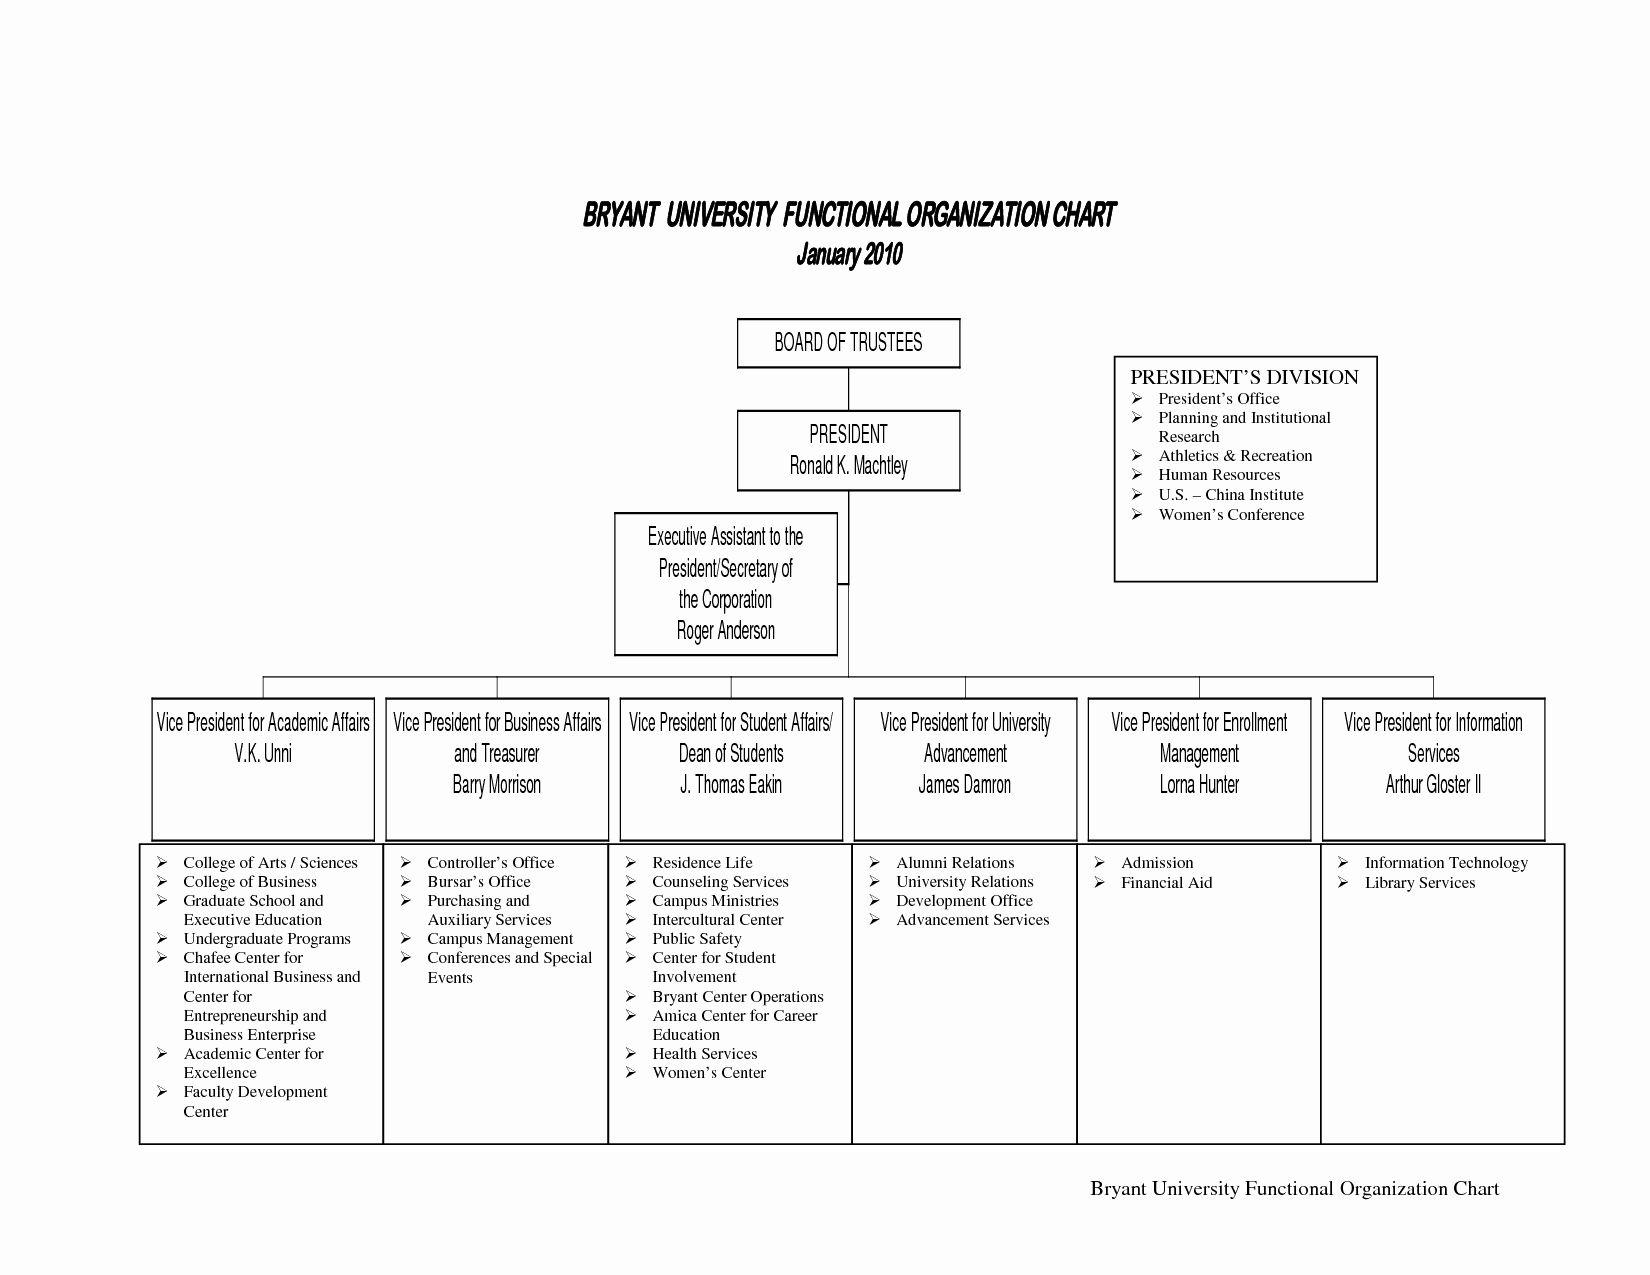 Non Profit Organizational Chart Template Best Of 10 Best Of Small Non Profit Organizational Chart Organizational Chart Education Quotes Quotes For Students